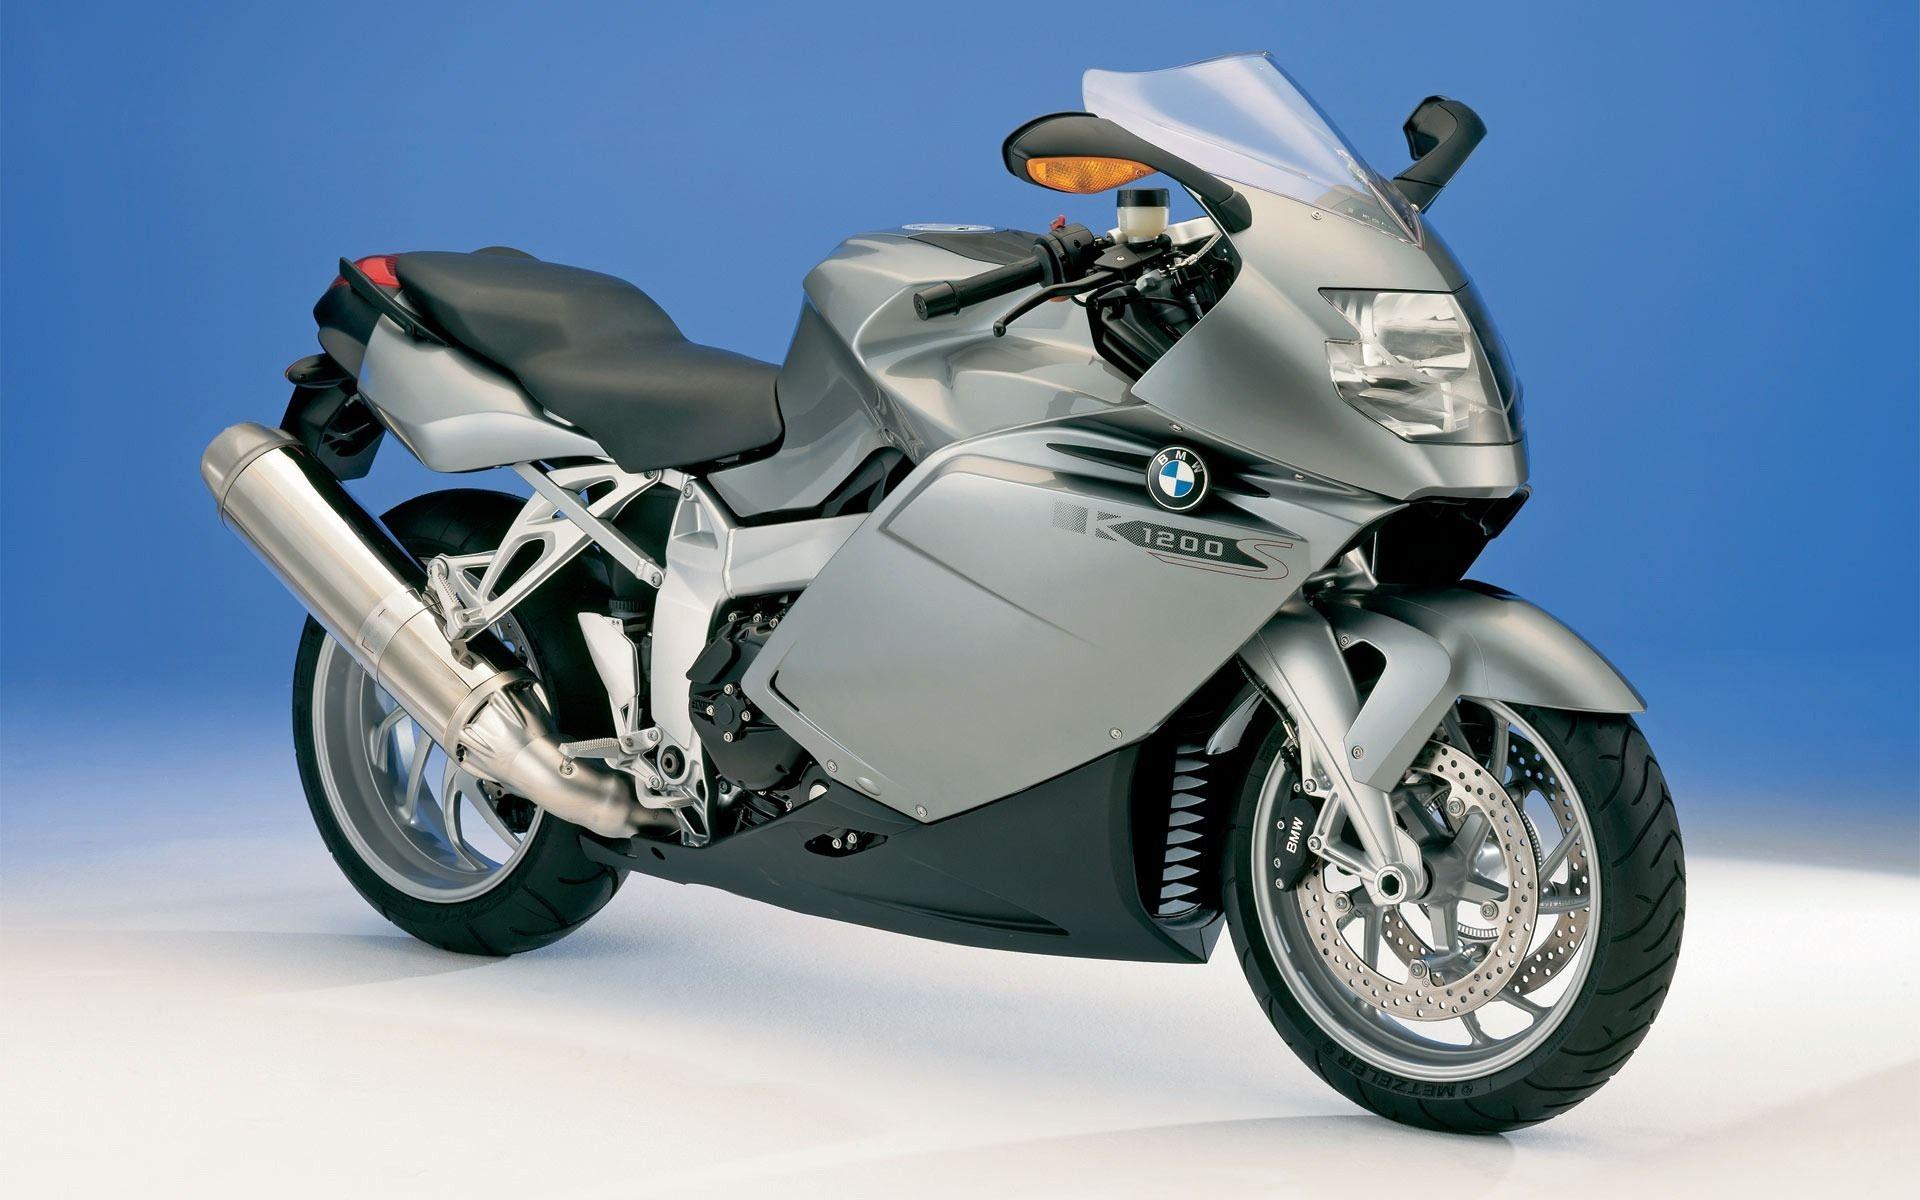 BMW K 1200 silver